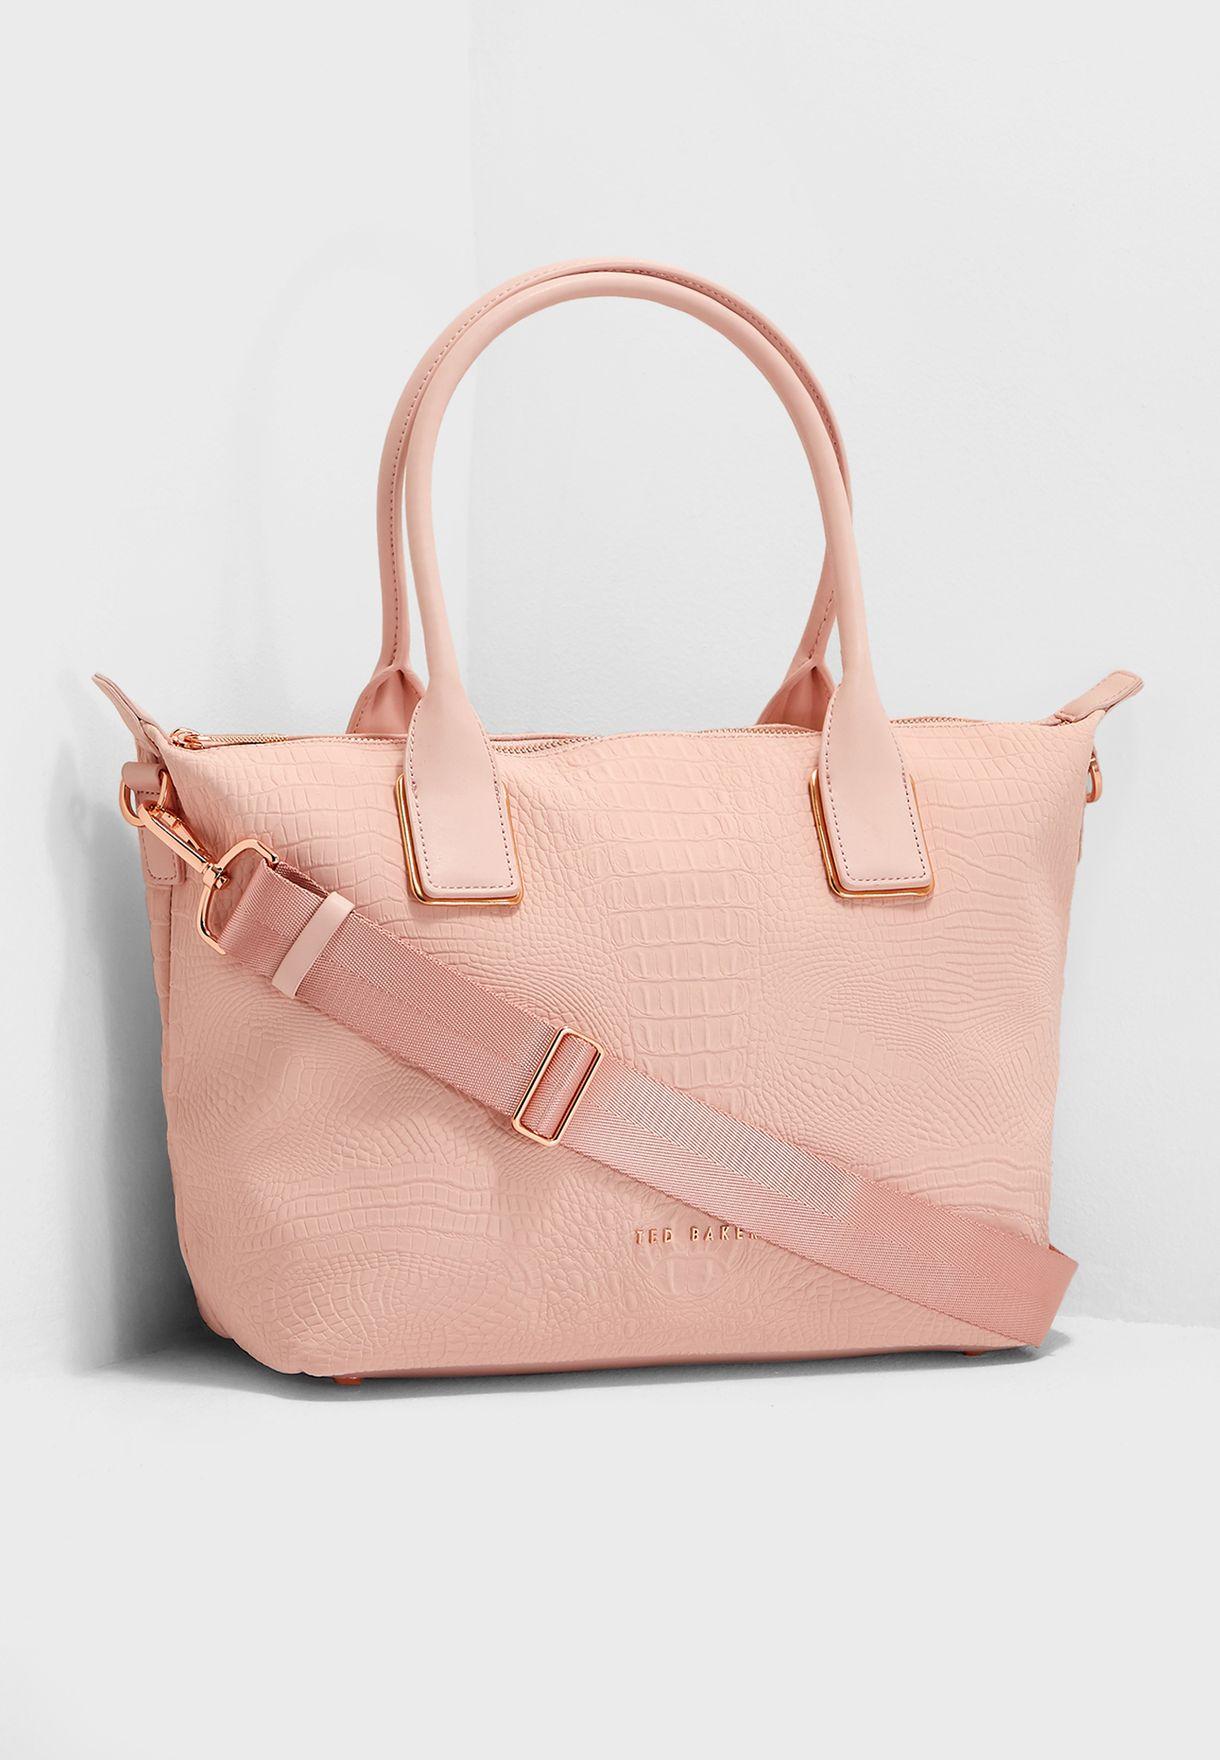 9413069483c7bc Shop Ted baker pink Ciscki Reflective Shopper 148936 for Women in ...